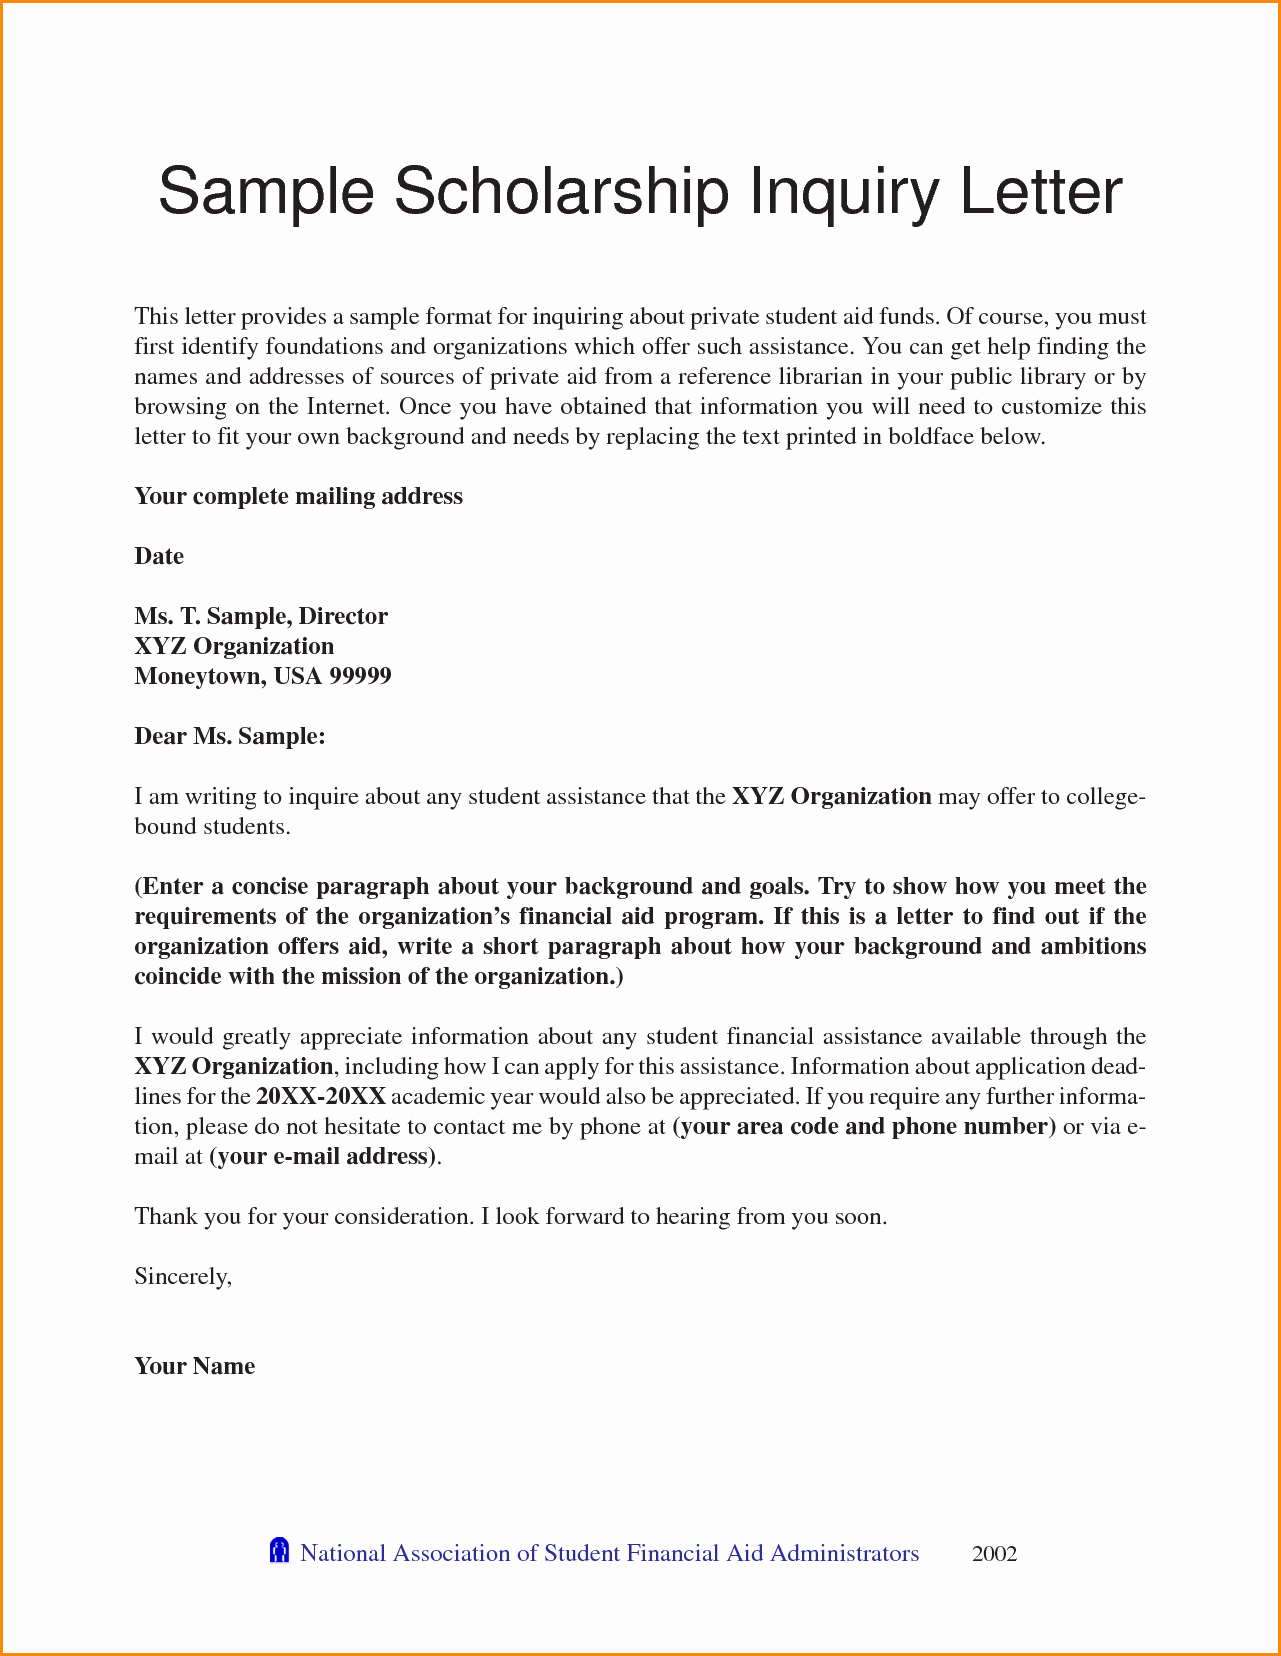 Recommendation Letter format for Student Best Of How to Write Re Mendation Letter for Student Scholarship